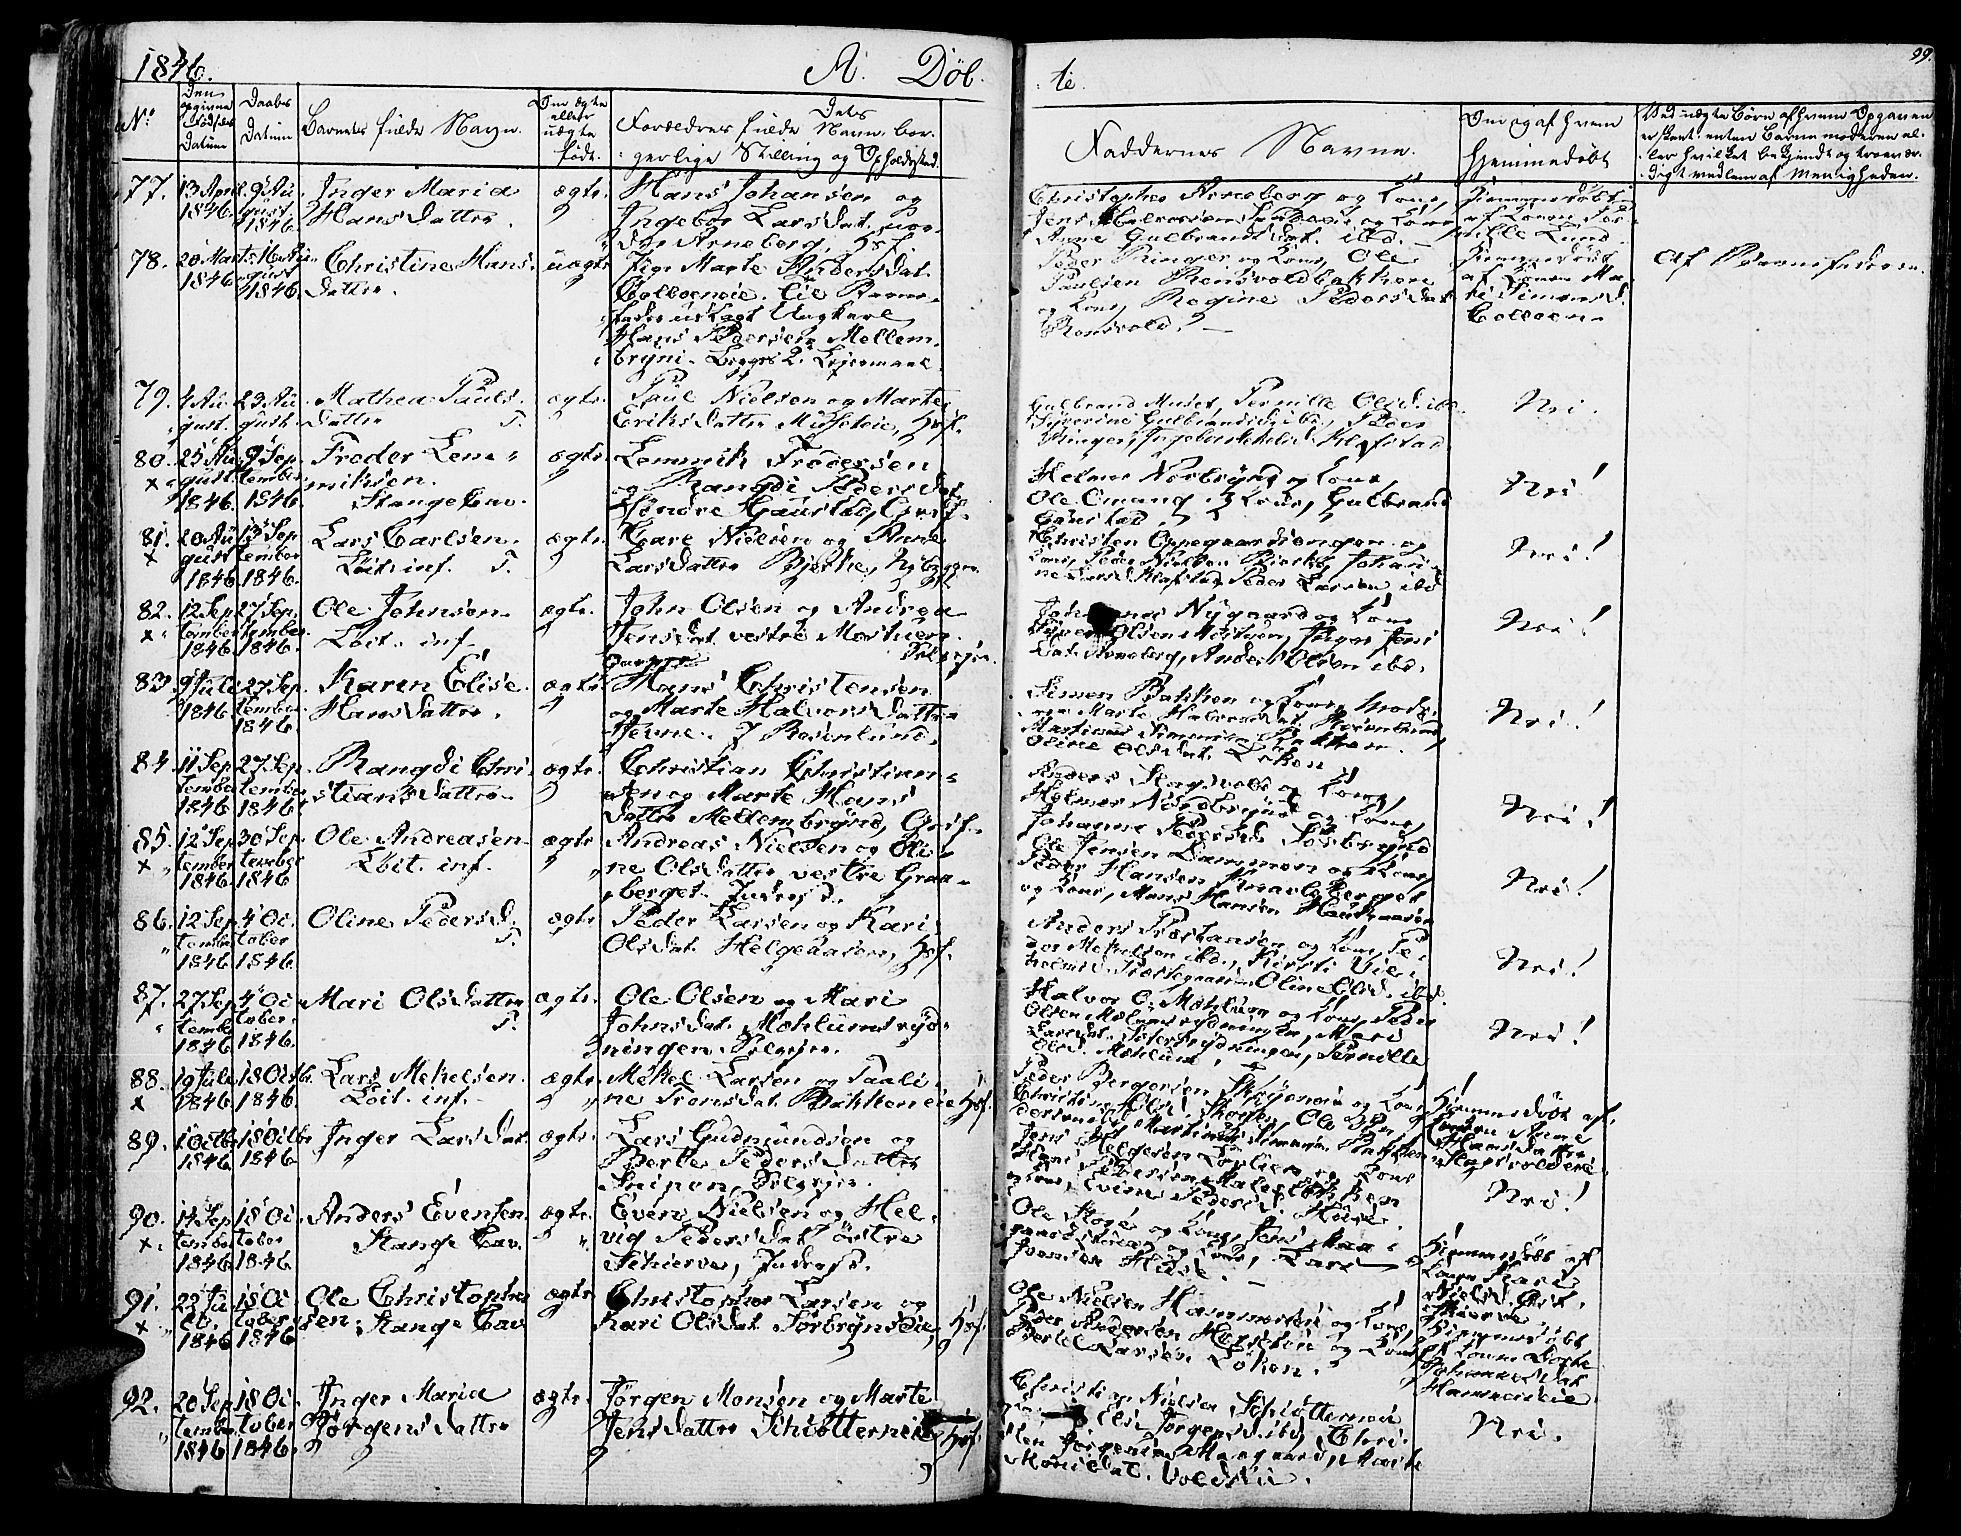 SAH, Romedal prestekontor, K/L0003: Ministerialbok nr. 3, 1829-1846, s. 99